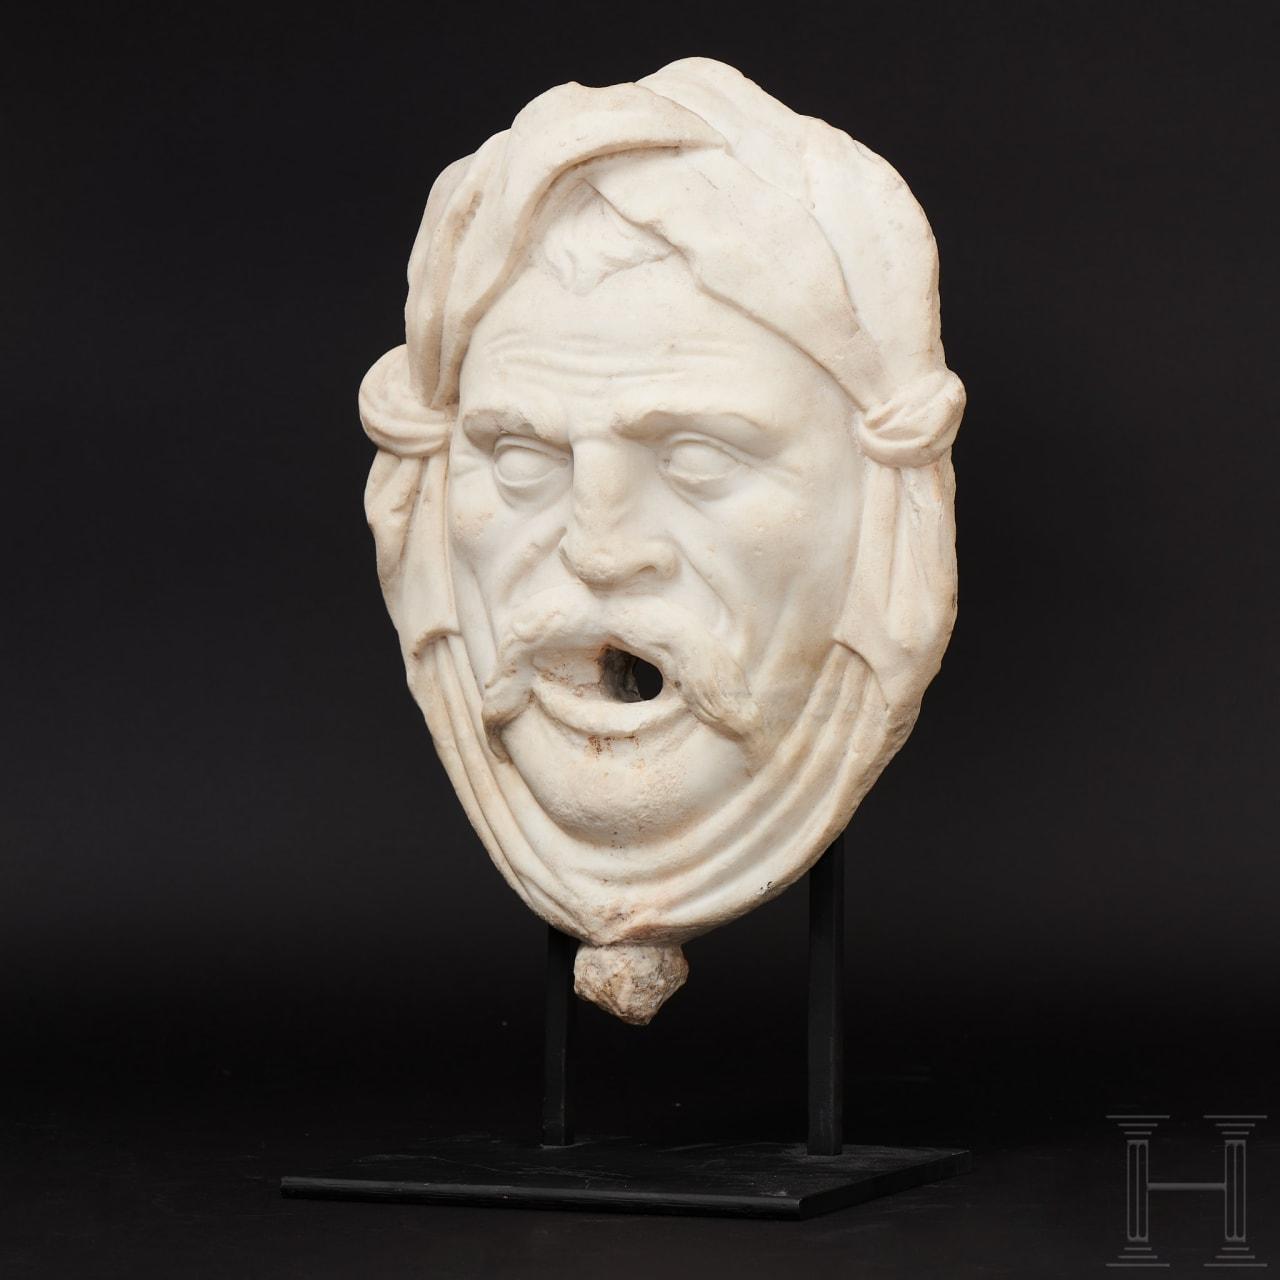 An Italian fountain mask in marble, 16th/17th century